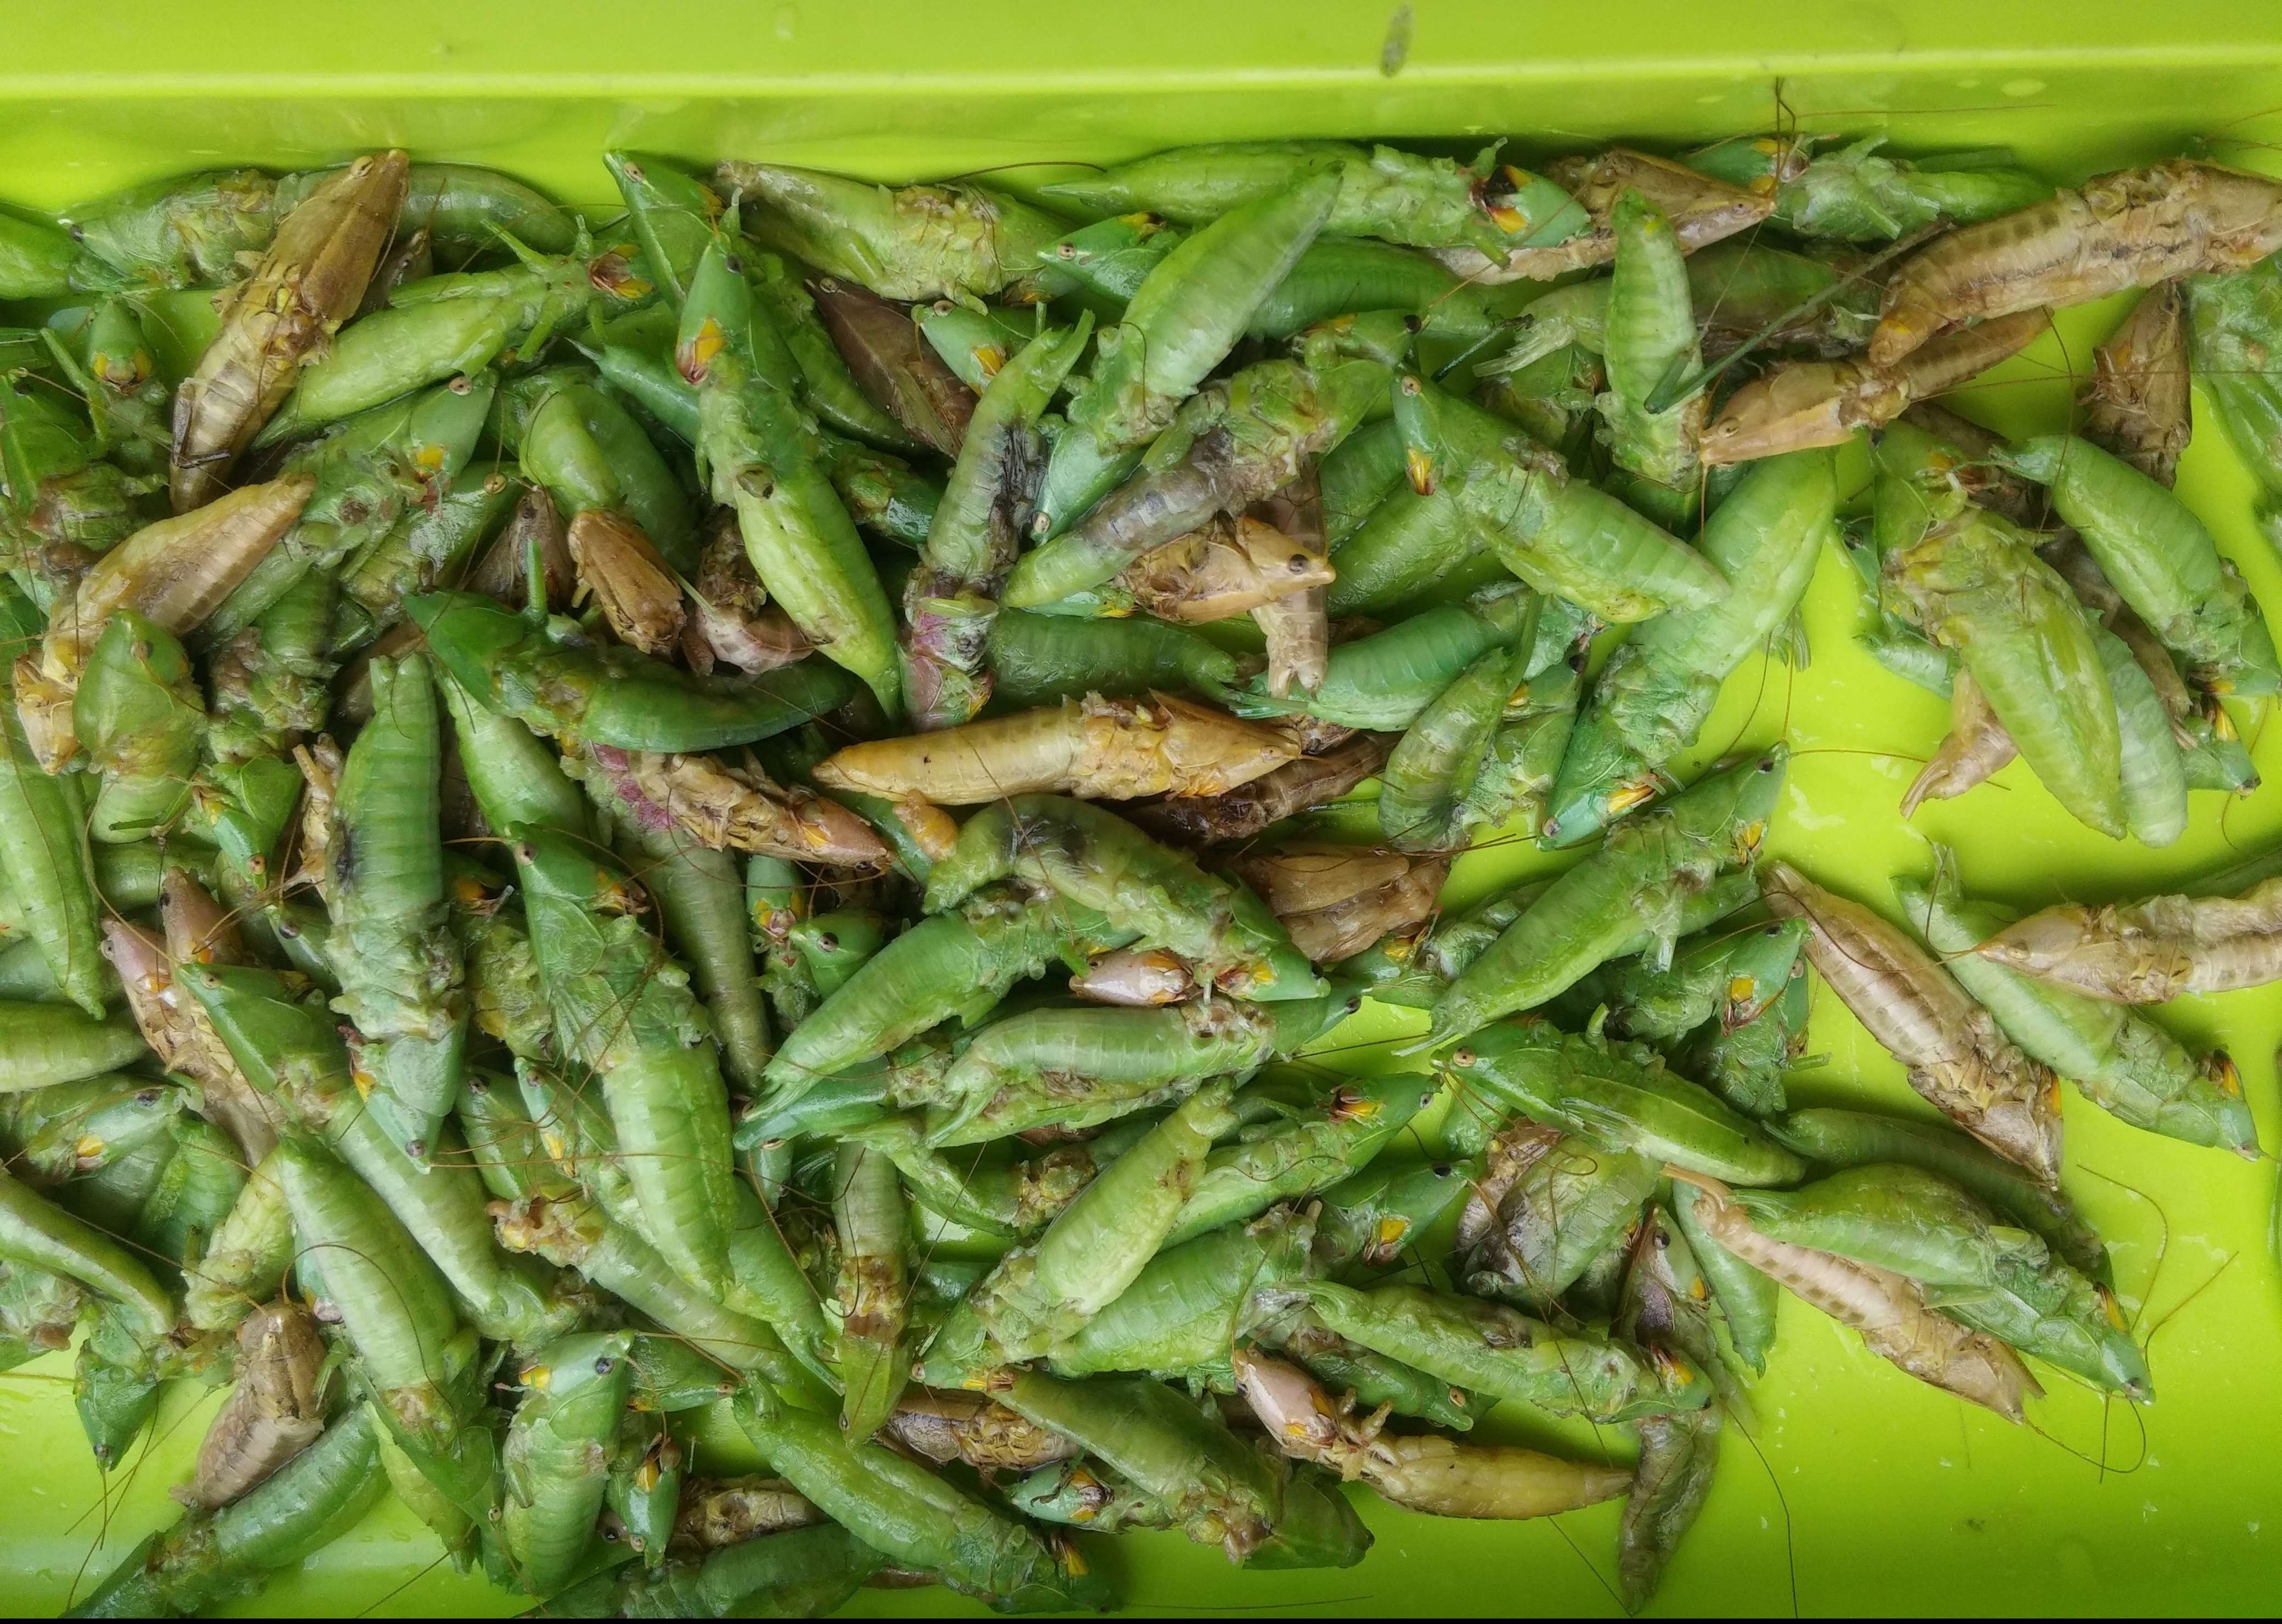 nsenene, grasshoppers, 4foodssakeeat.com, uganda